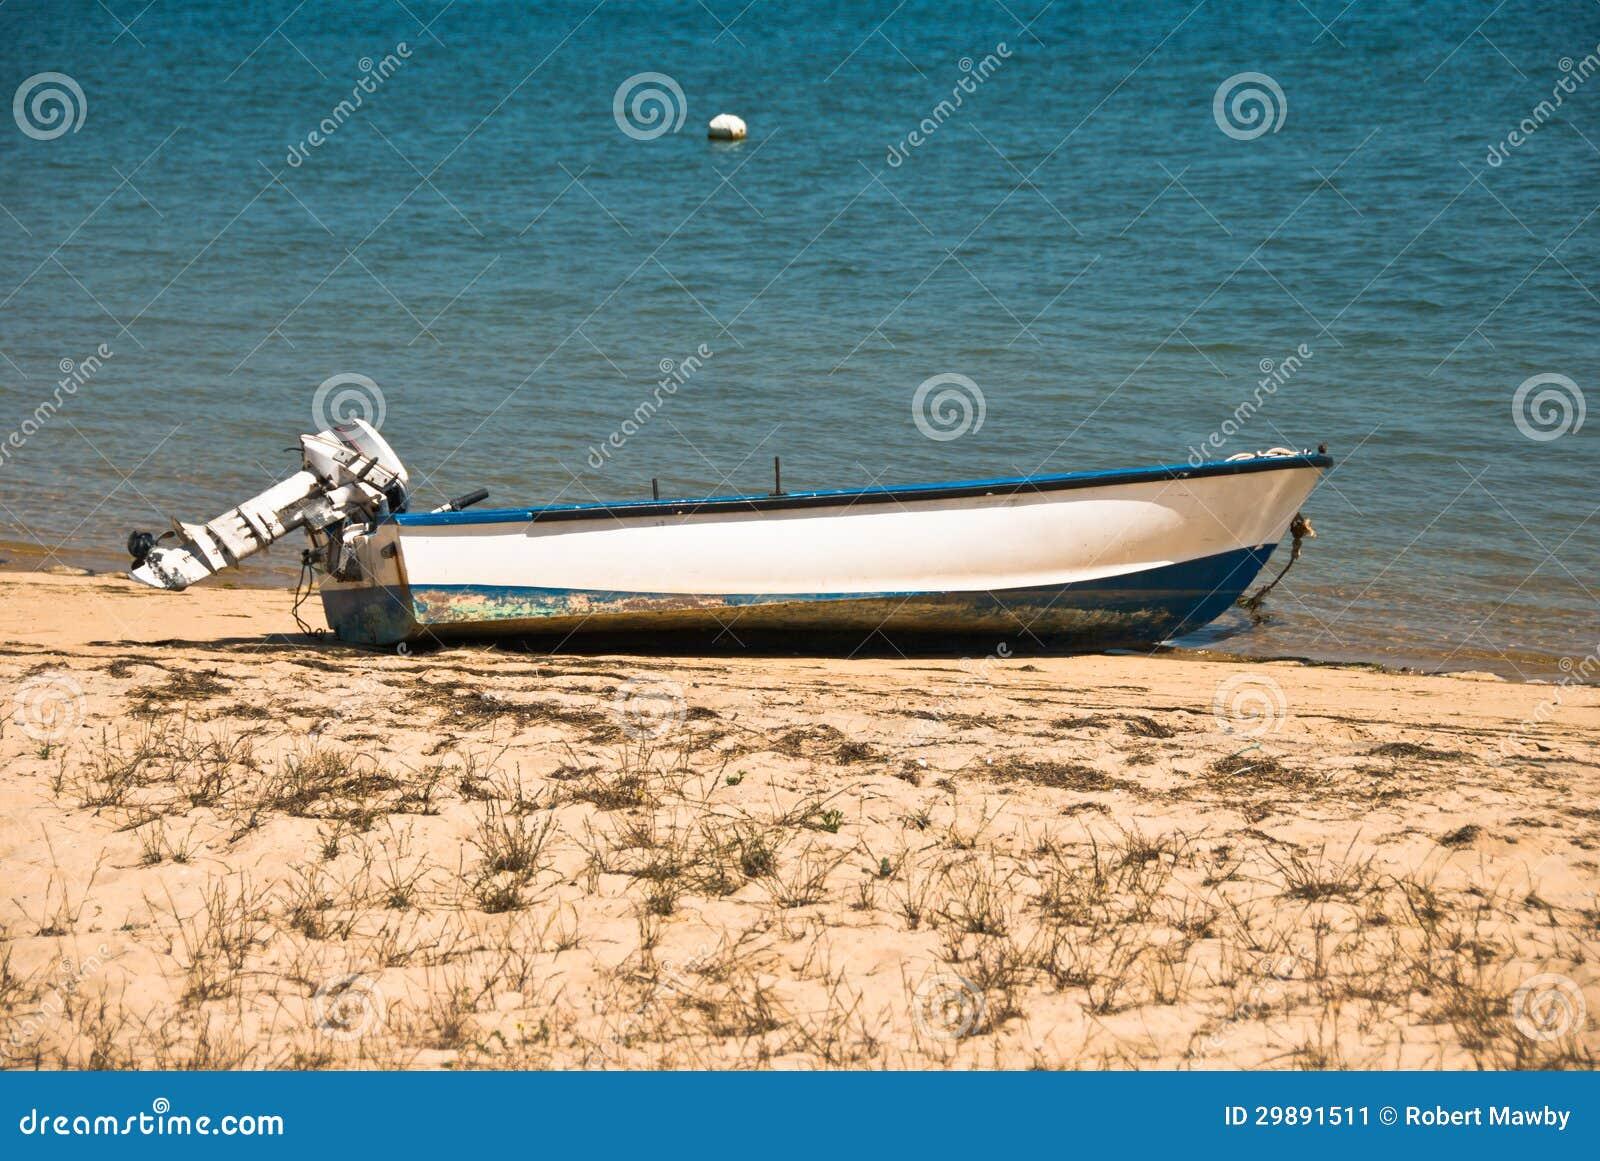 Karmiz This Business Plan For Boat Charter